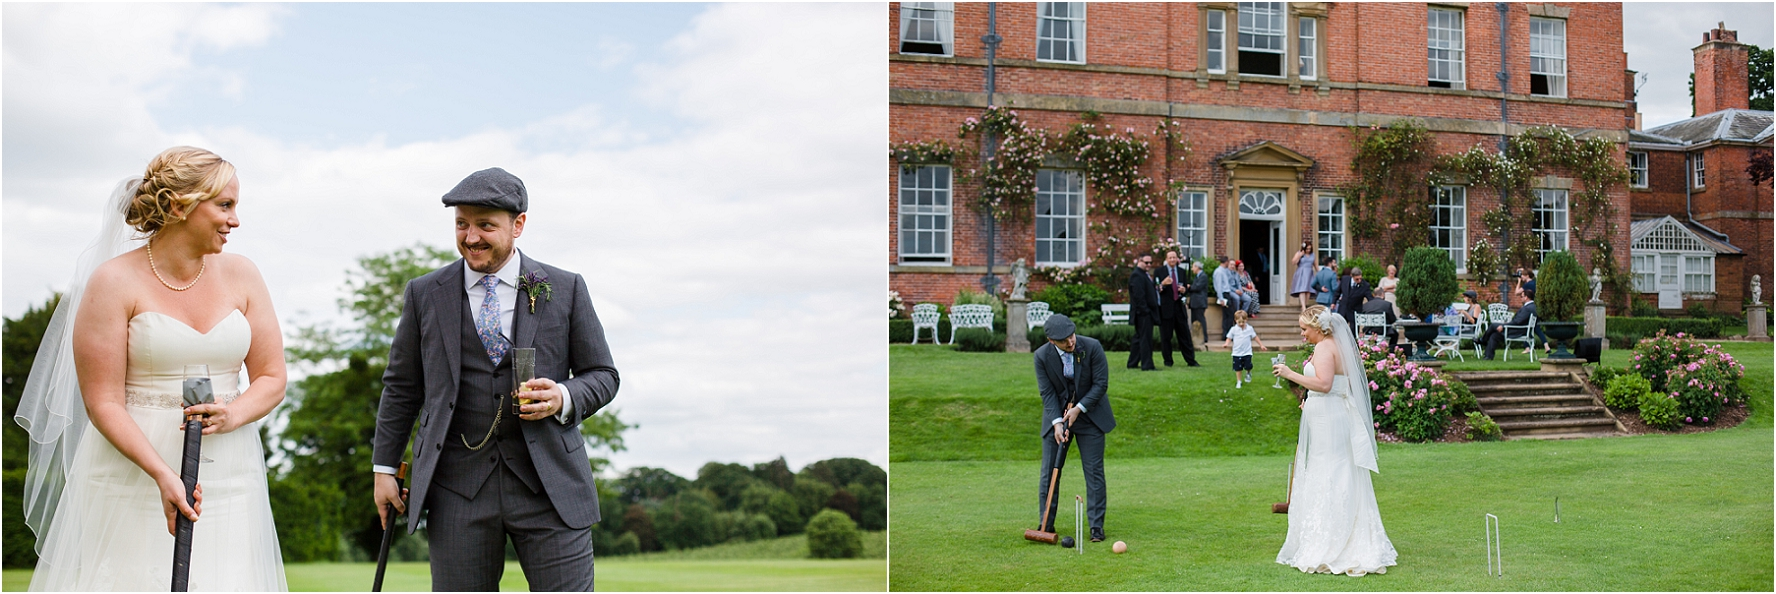 wedding-photography-the-orangery-settringham_0474